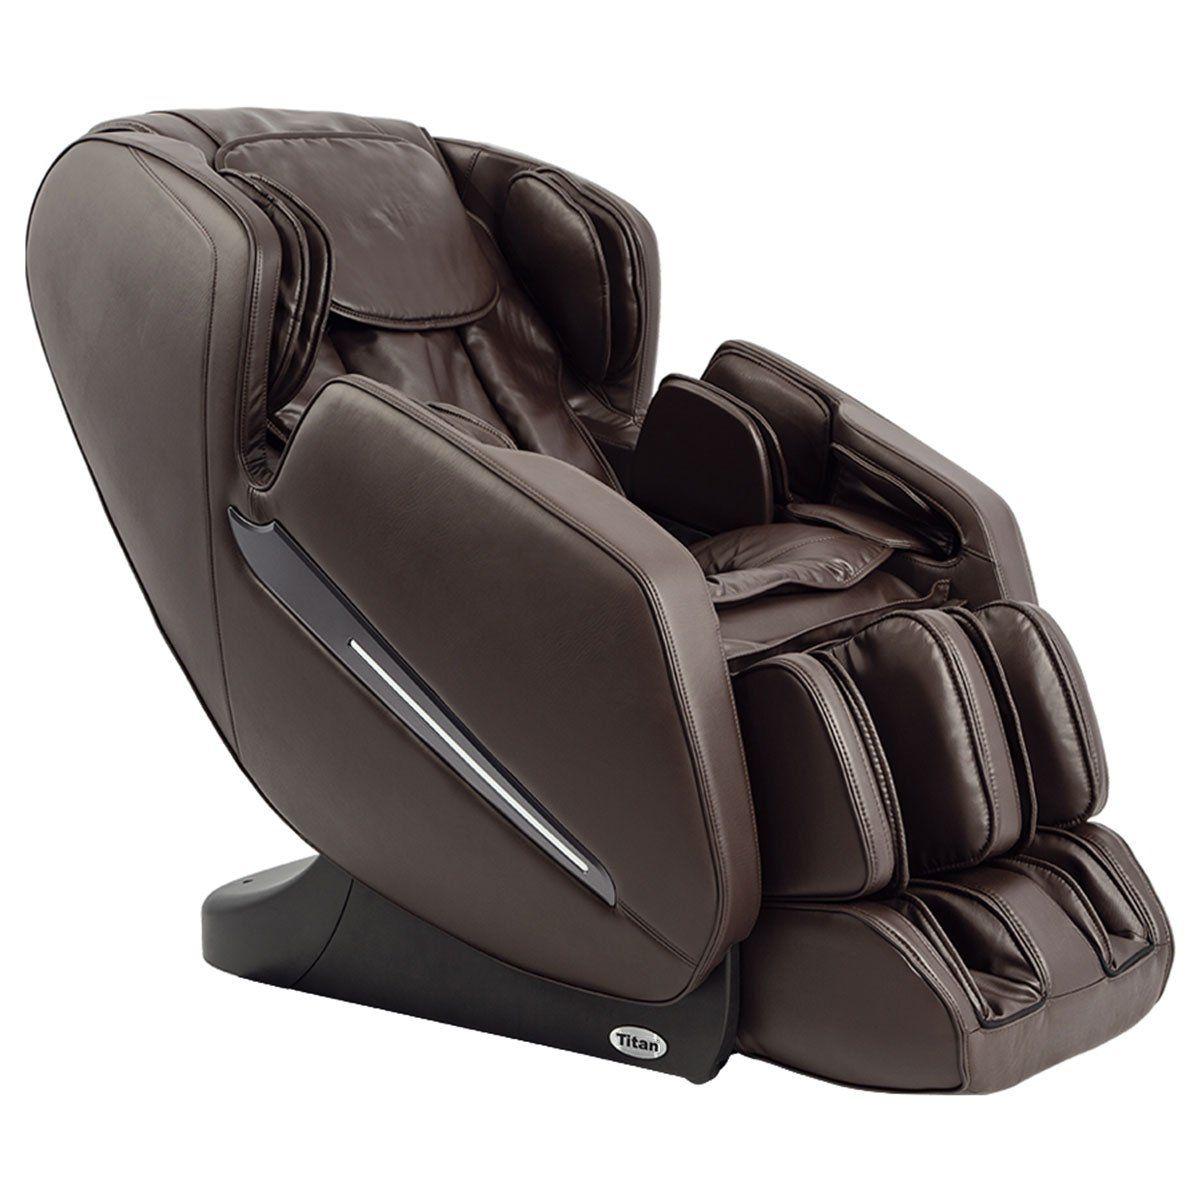 Titan Tp Carina Massage Chair Massage Chair Planet Massagechairplanet Com Massage Chair Feet Roller Remote Holder